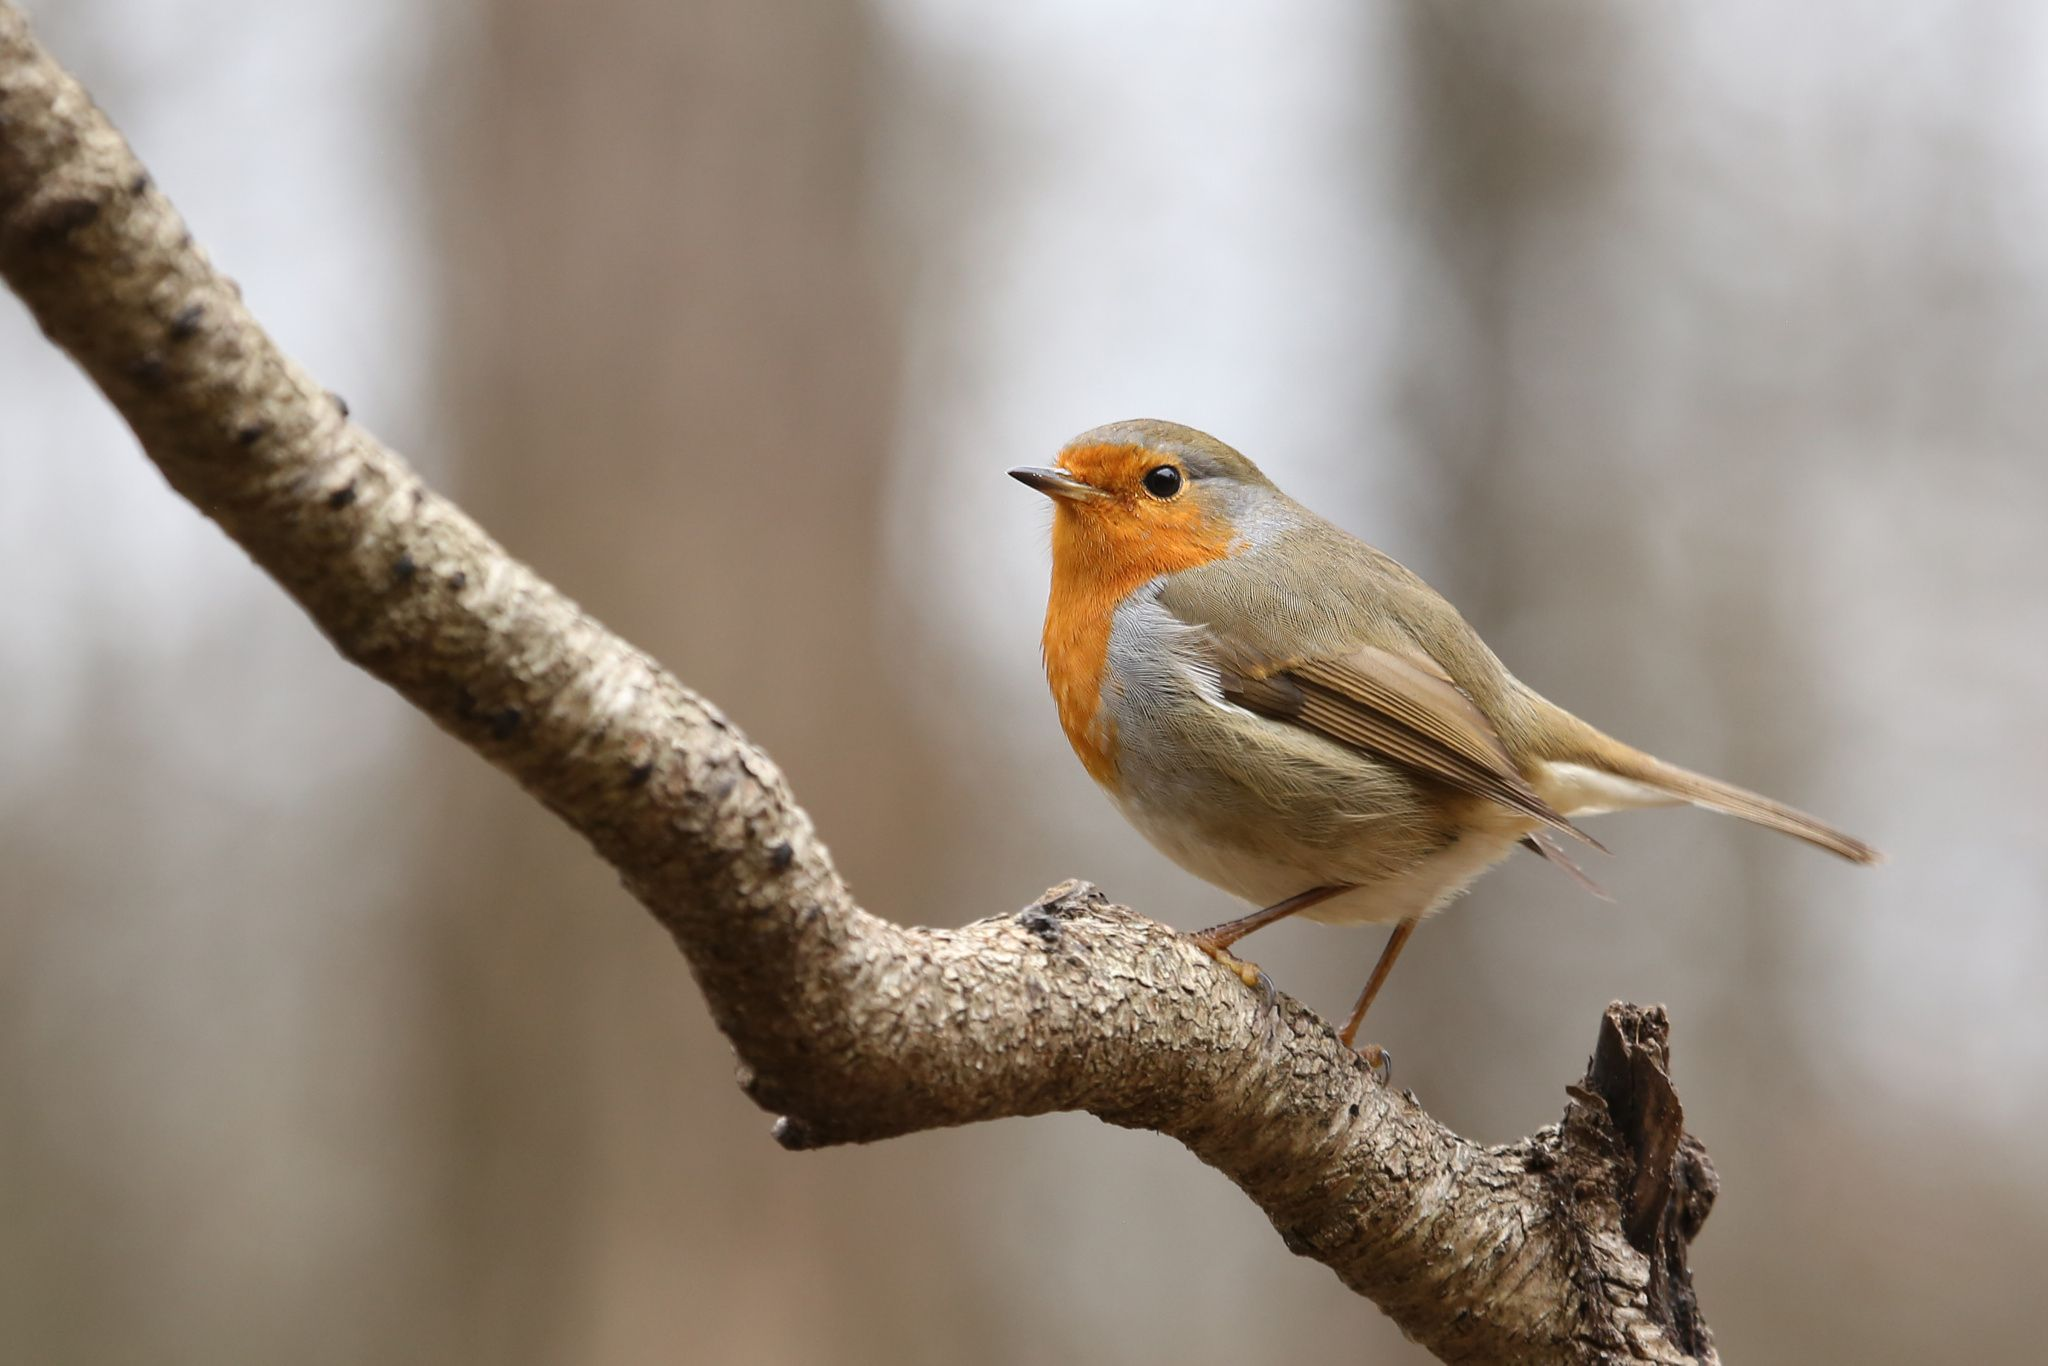 European Robin - European Robin, Erithacus rubecula